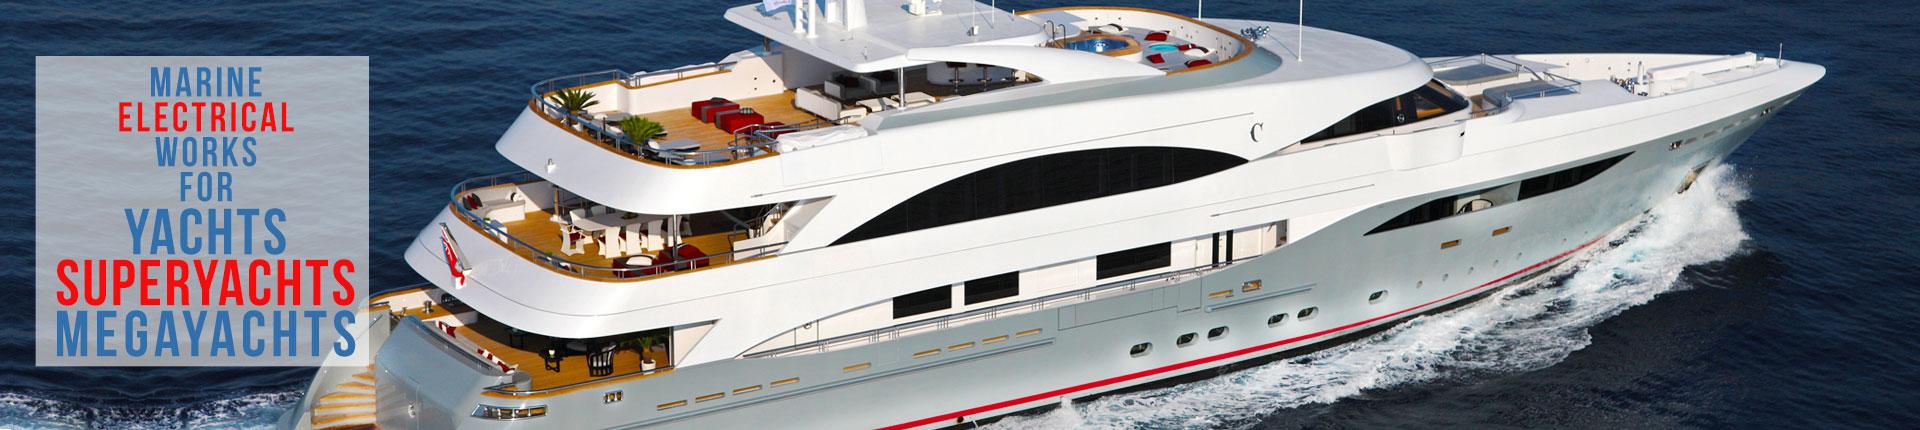 electronaval-yachts-superyachts-megayachts